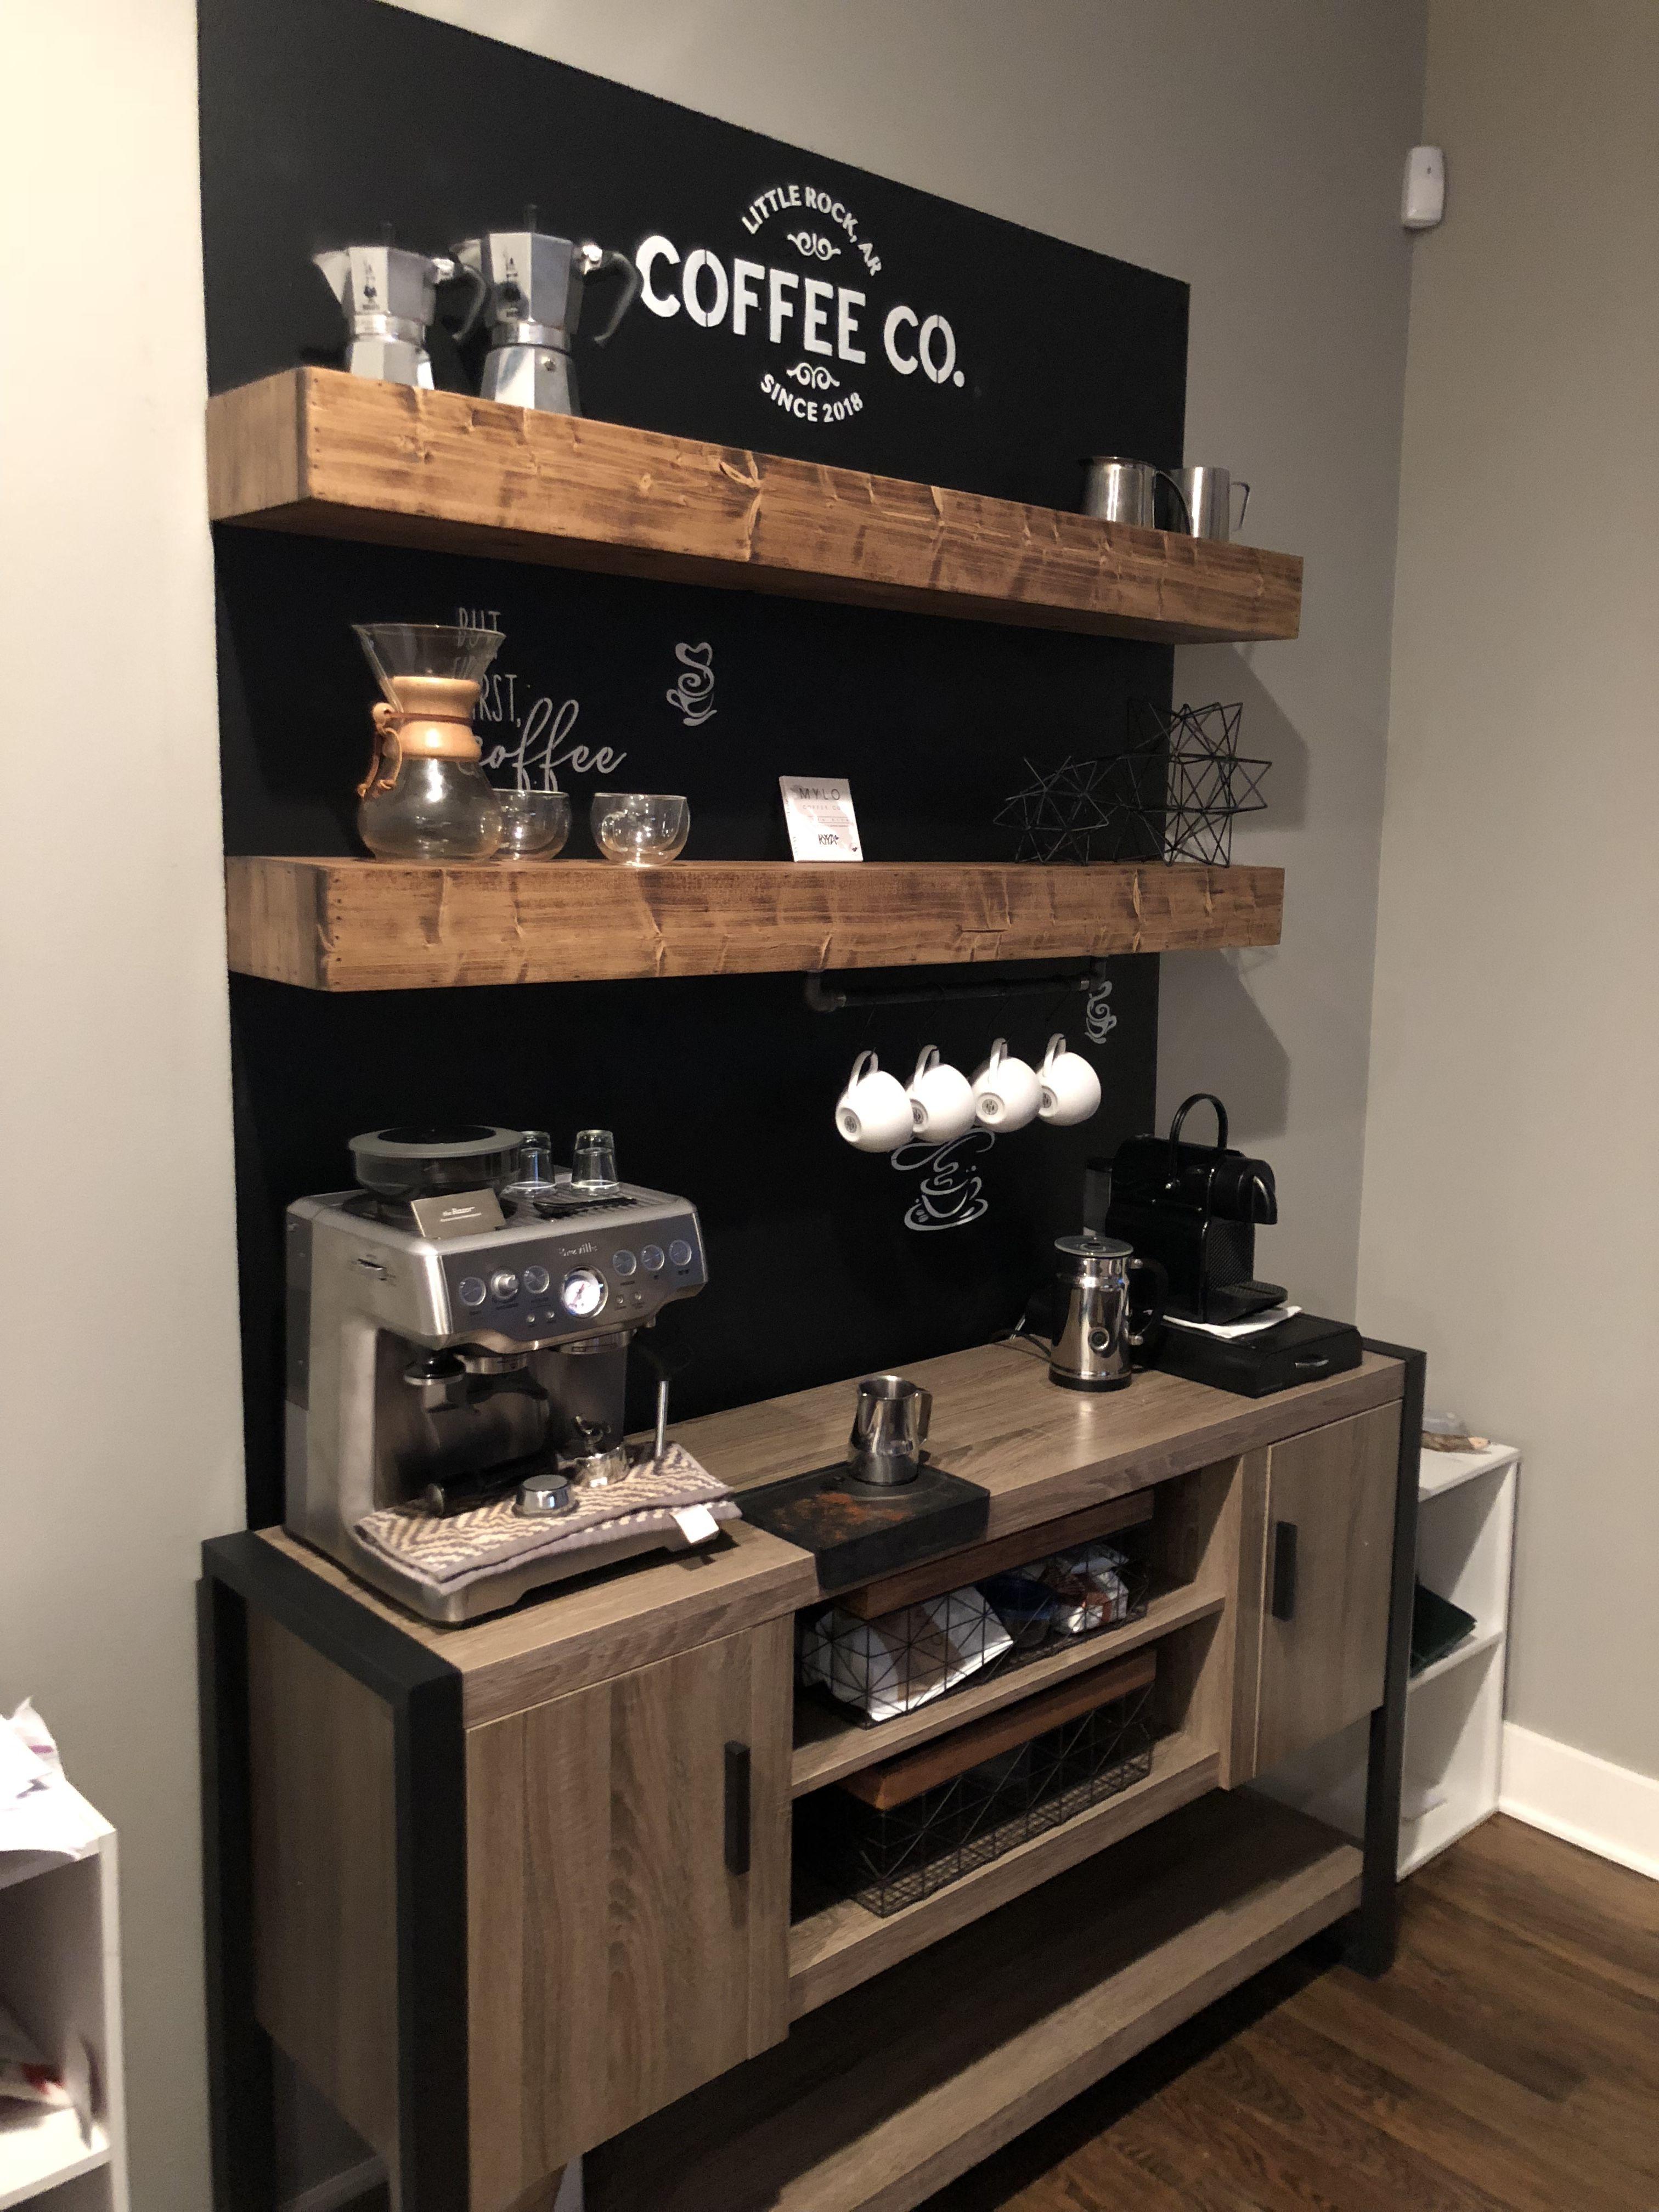 Coffee stand | Coffee bar home, Coffee bar design, Diy ...